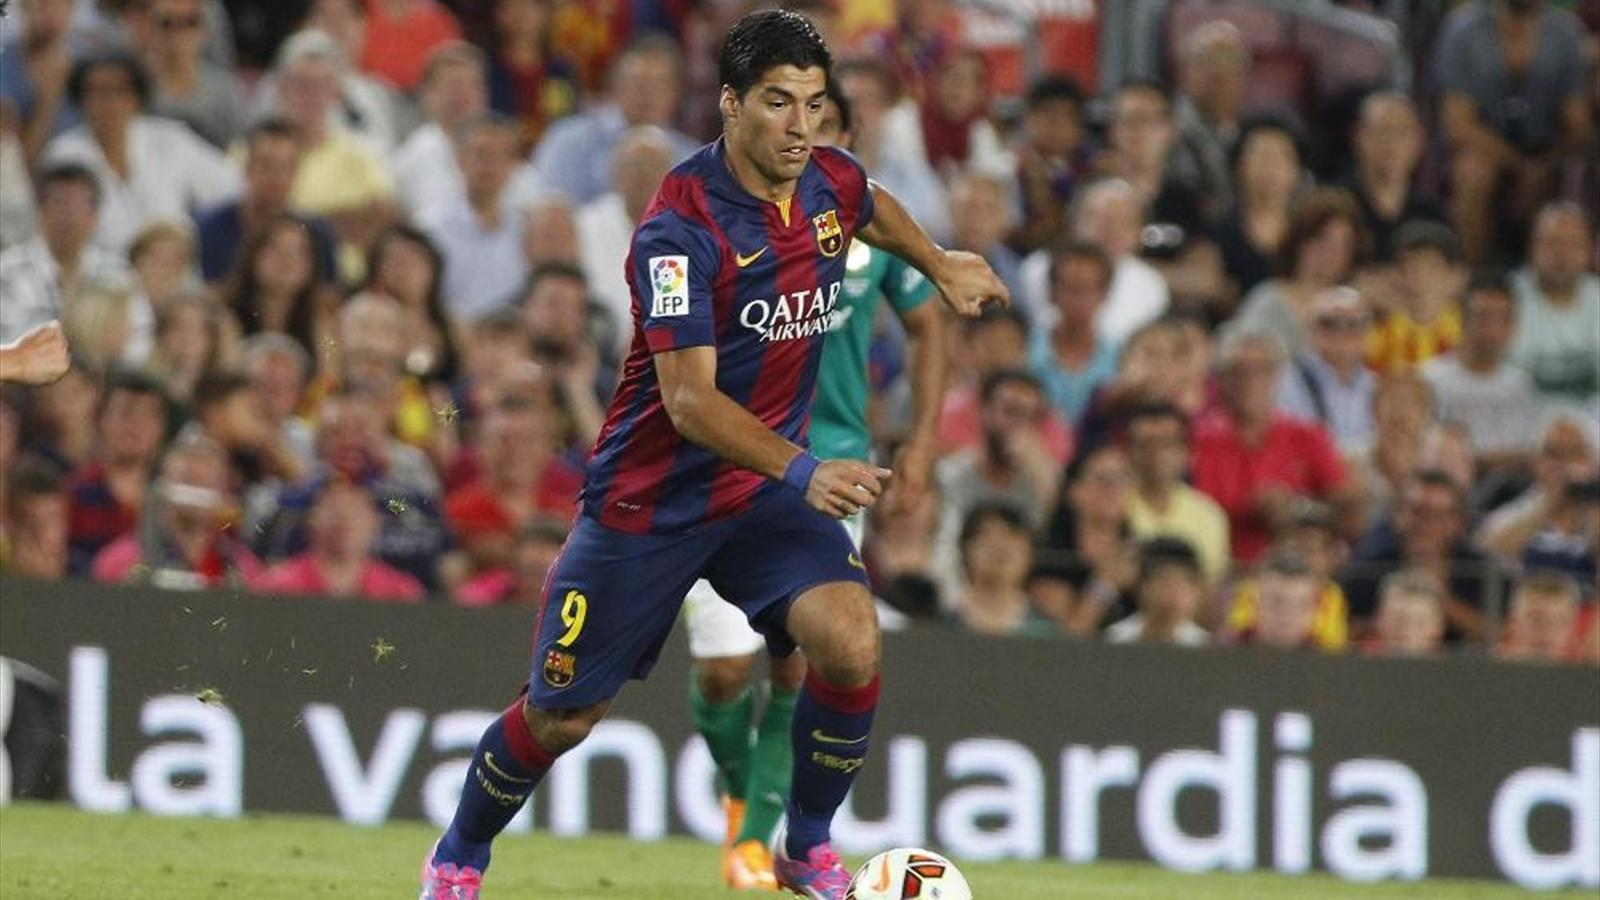 Чемпионат Испании. Луис Суарес дебютирует за «Барселону» в матче против «Реала